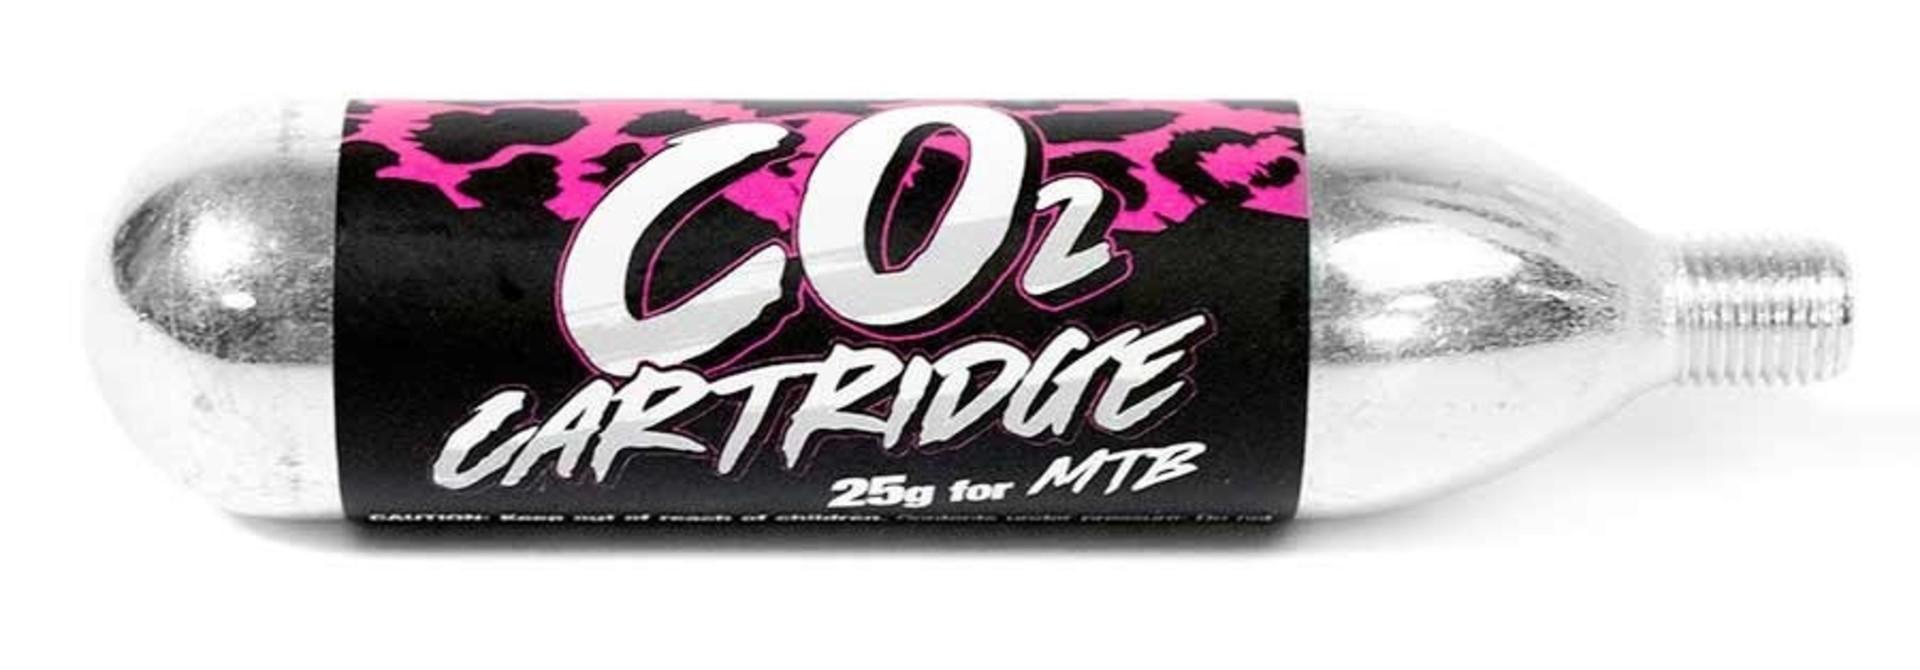 Muc-Off, 25g CO2 Cartridges, Threaded, 25pcs